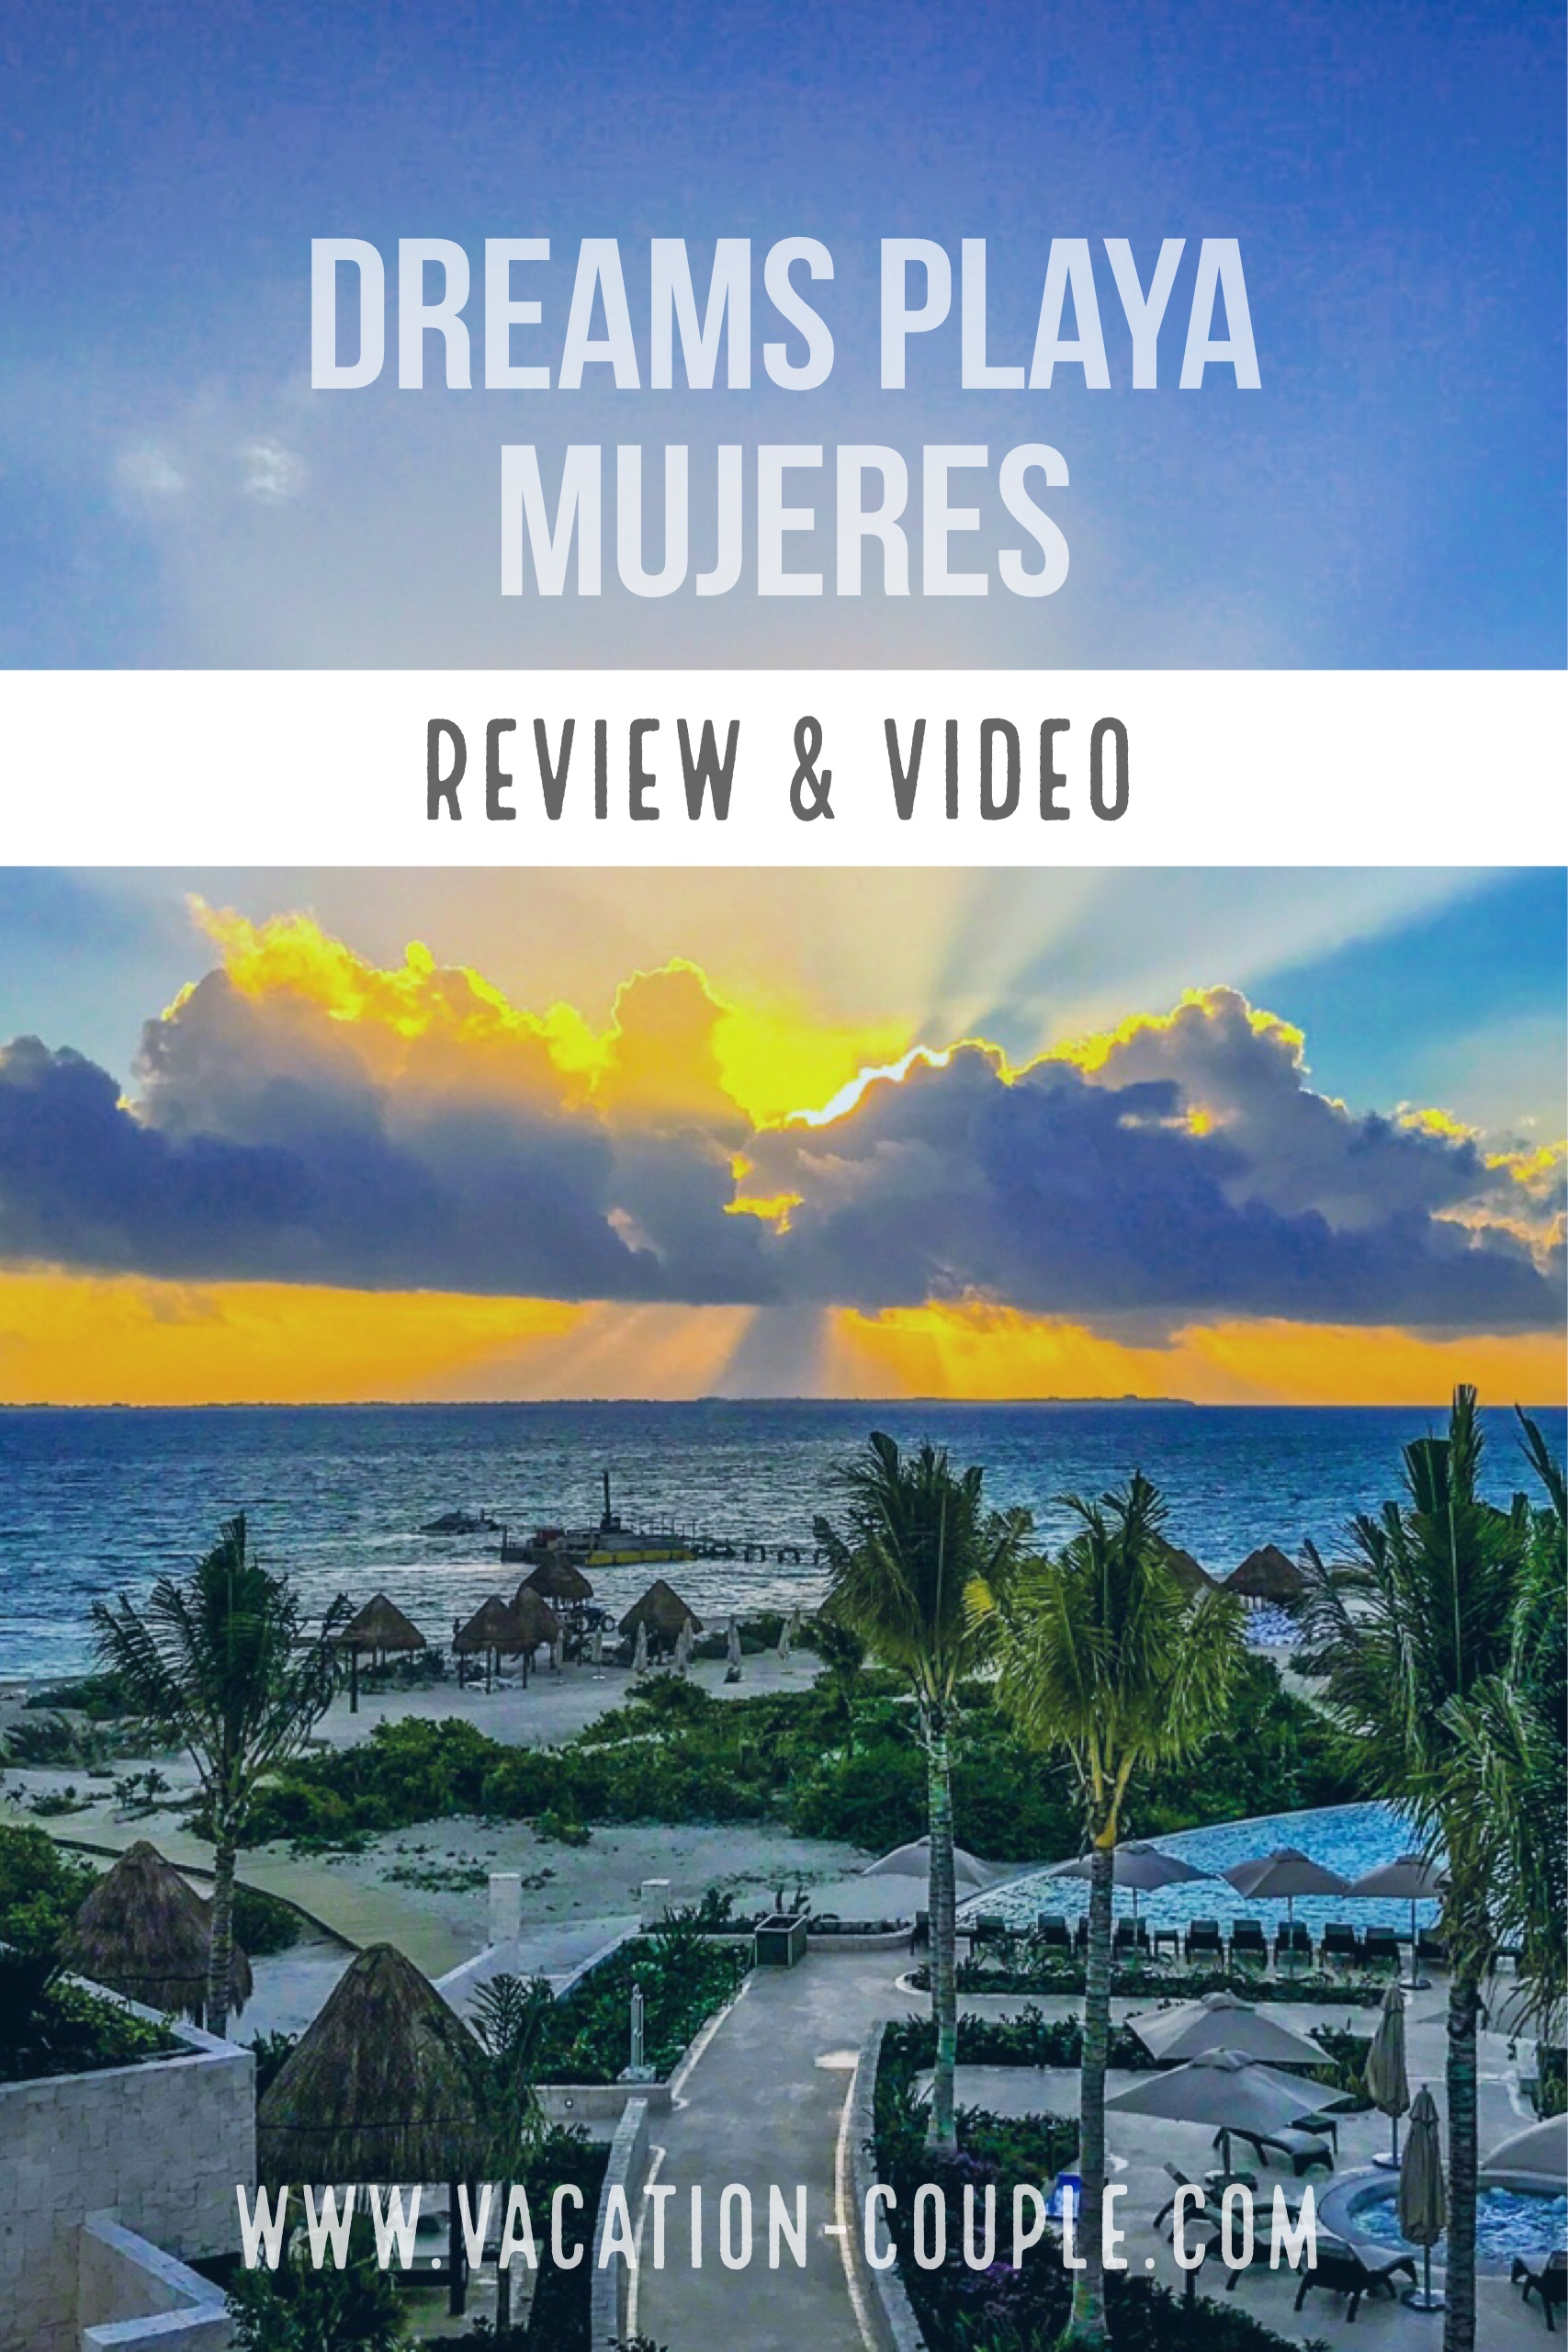 Vacation Couple reviews Dreams Playa Mujeres Resort & Spa. Kristin & Shadi review the layout, waterpark, restaurants, activities, and more! www.vacation-couple.com